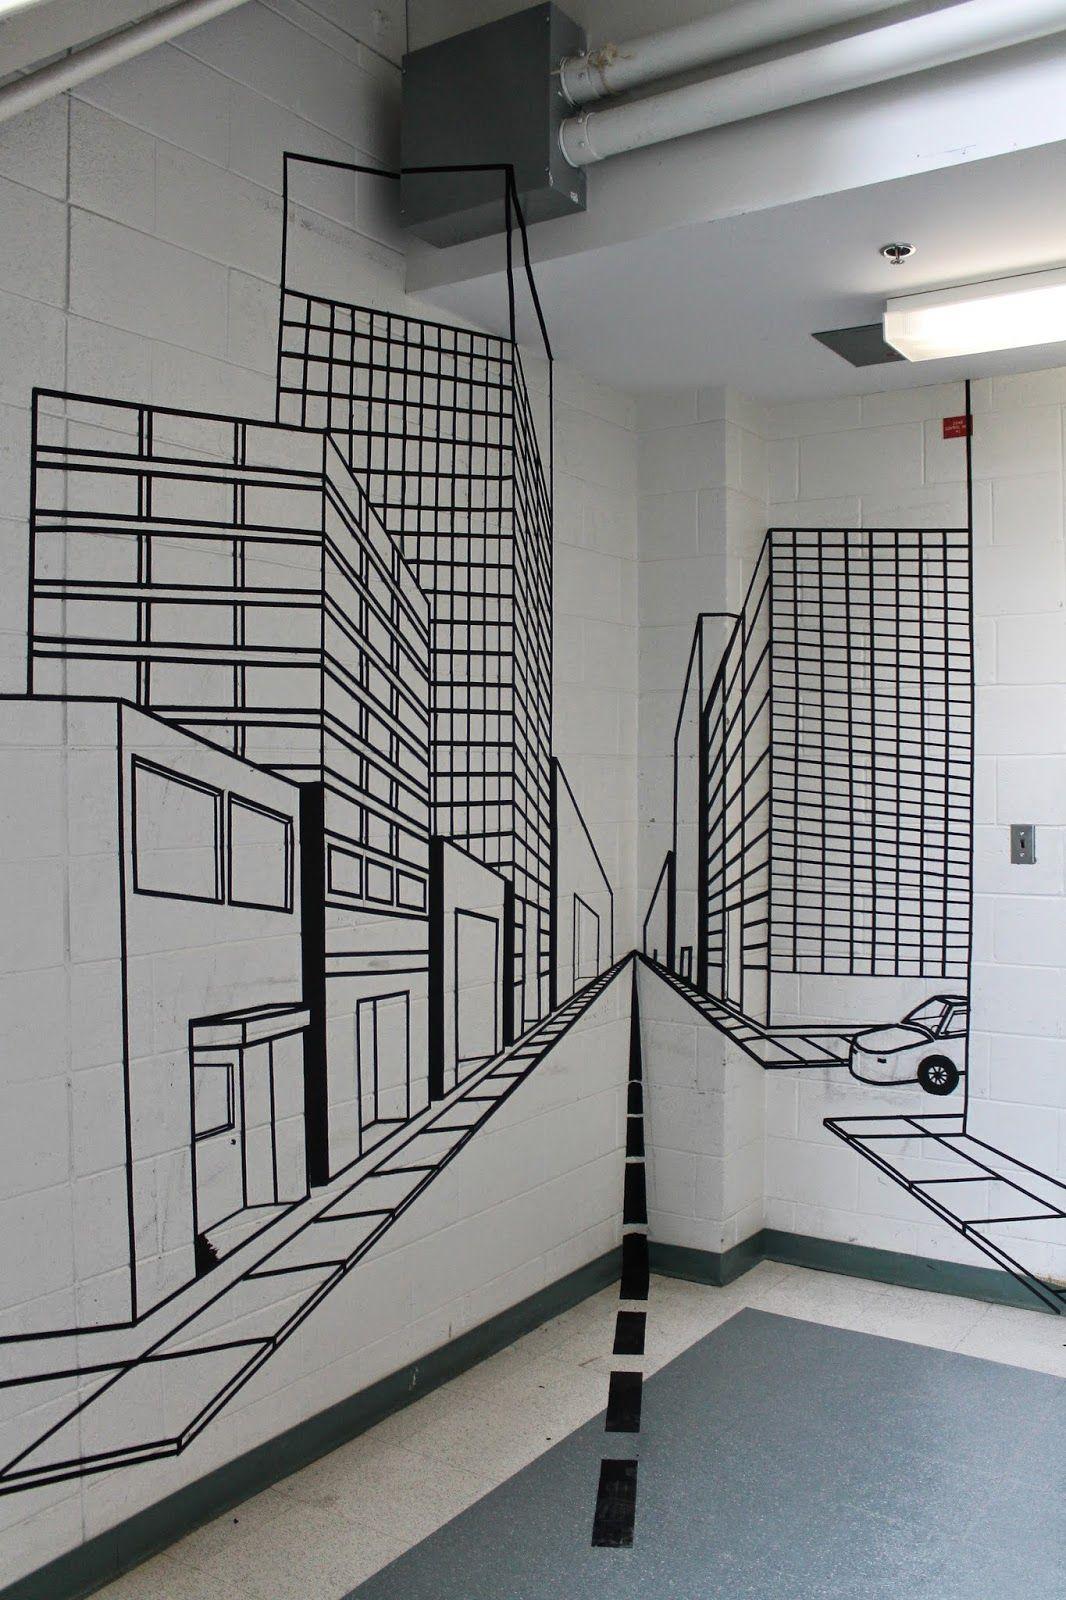 April S 2d Art Blog 2d One Point Perspective Tape Project Tape Art Perspective Art Tape Wall Art